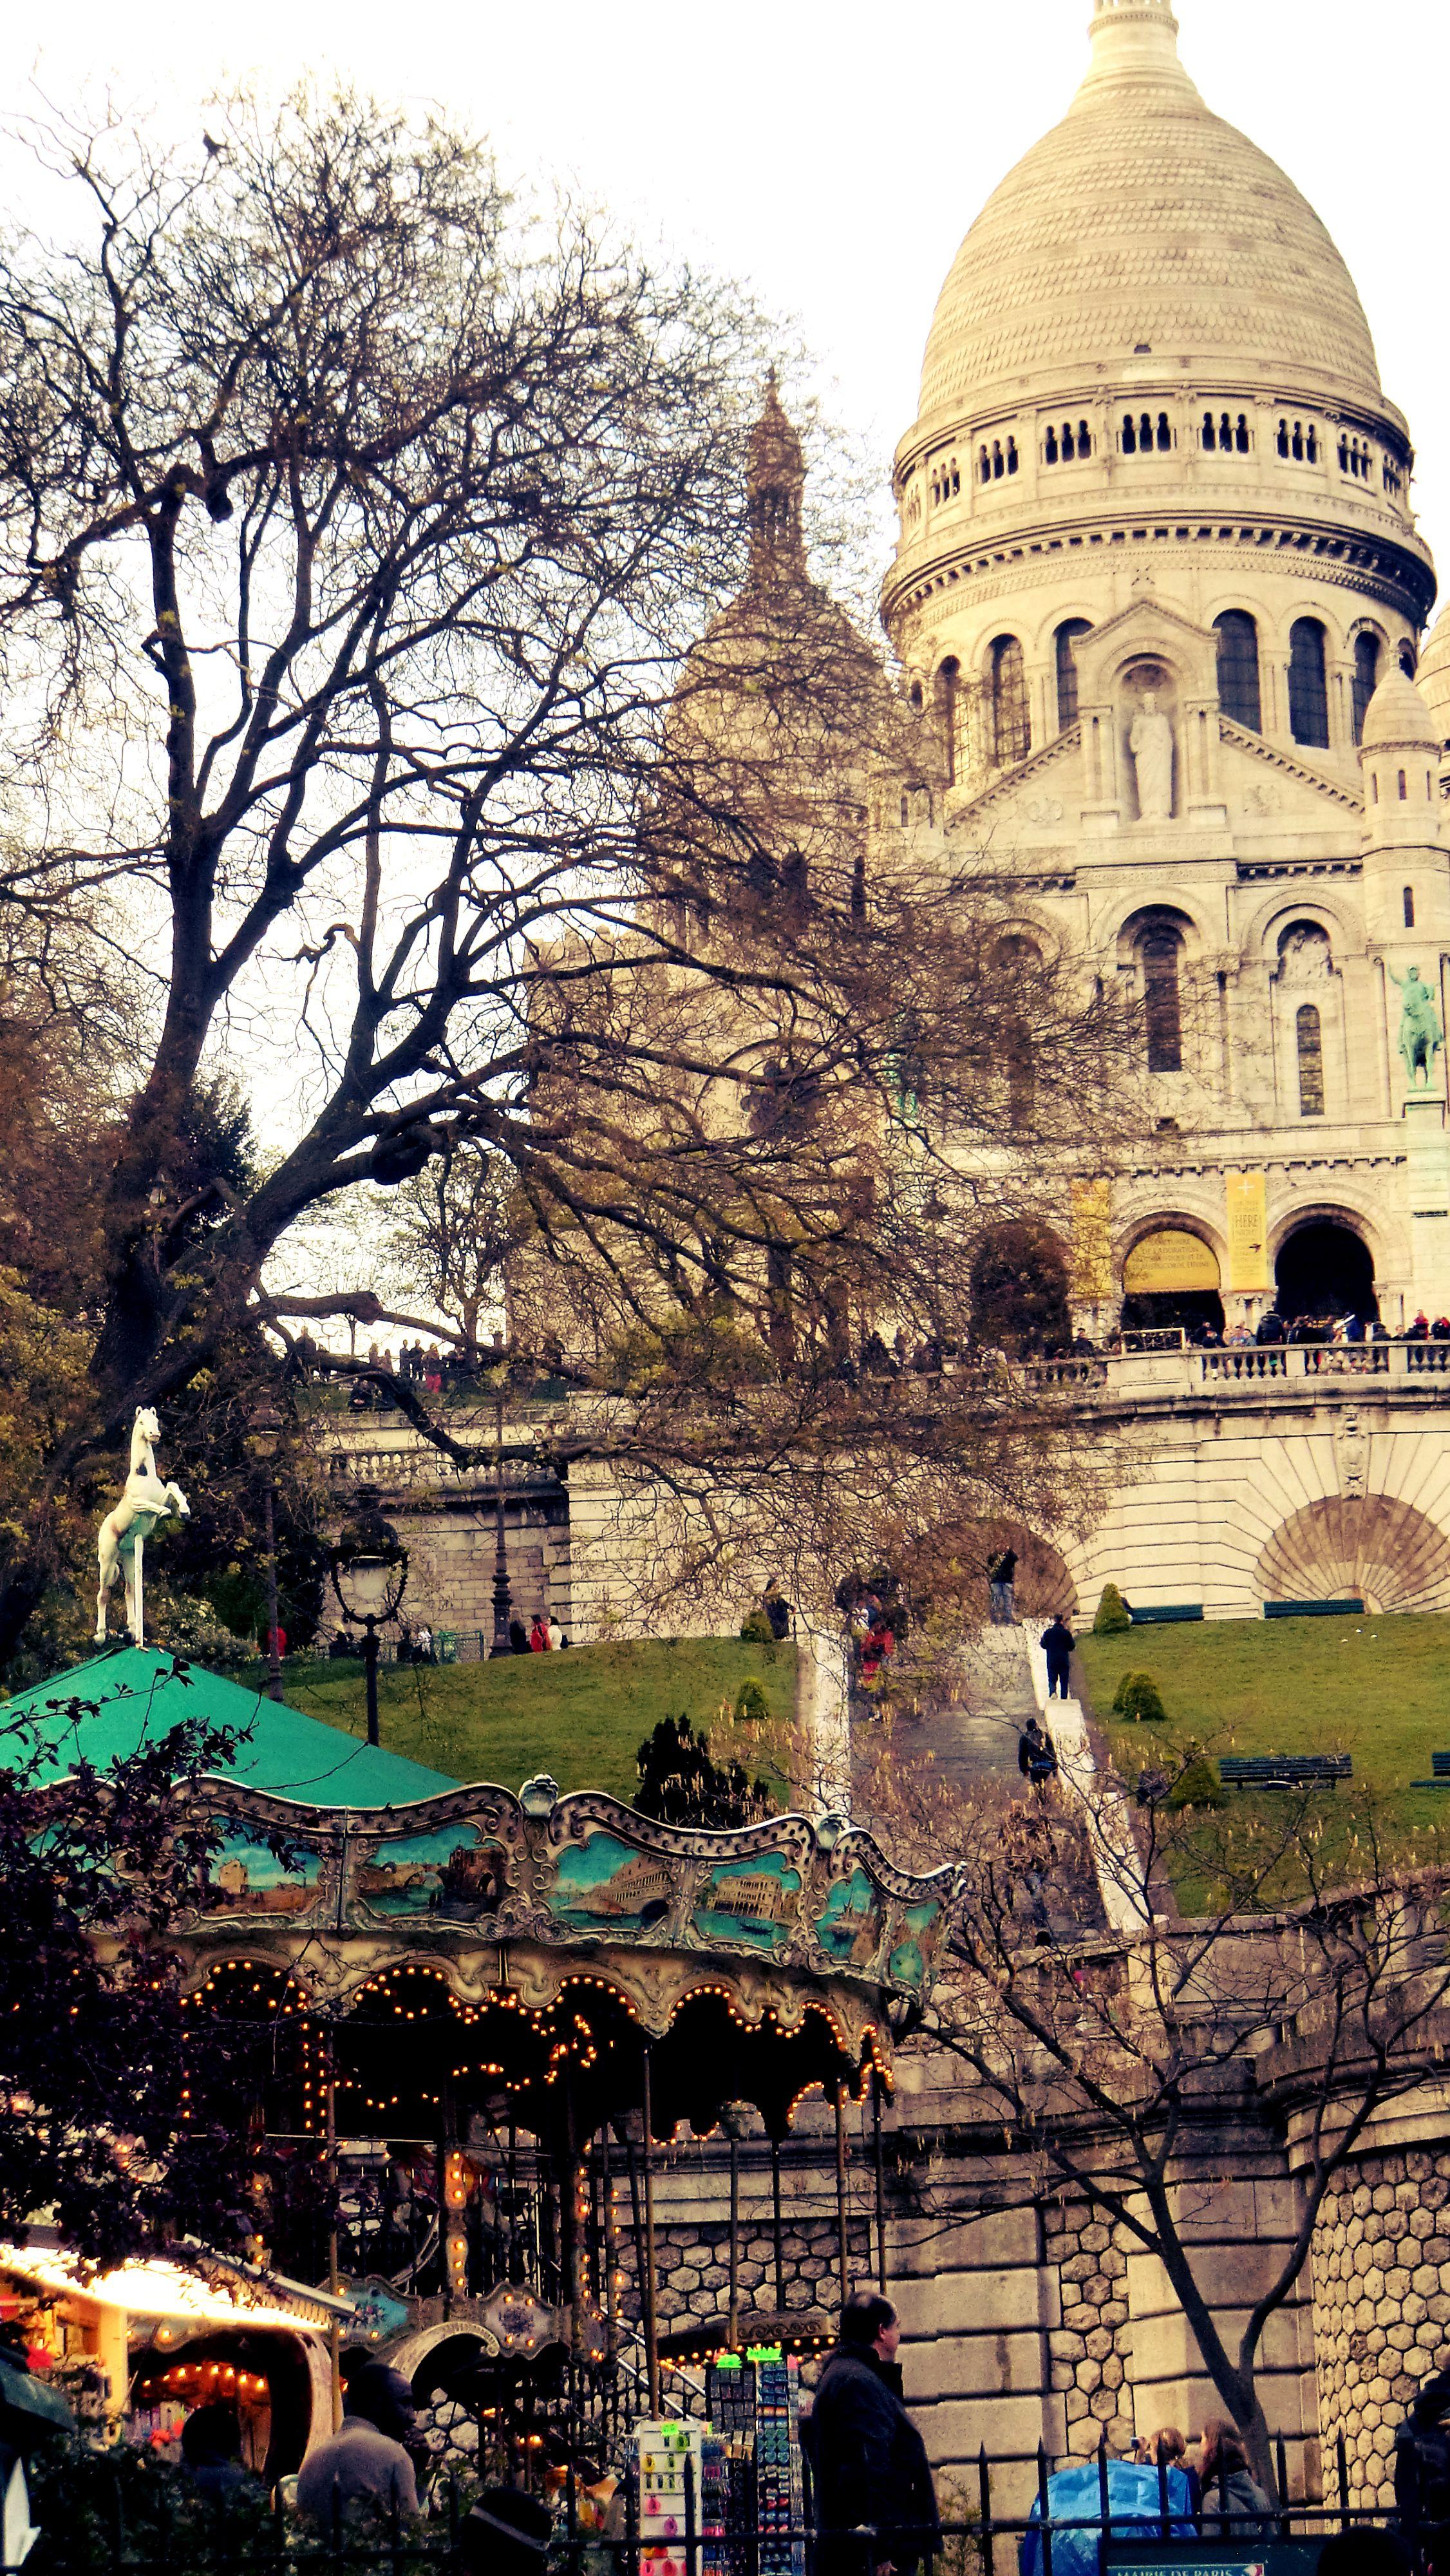 The carousel outside Sacre Coeur ~ Paris